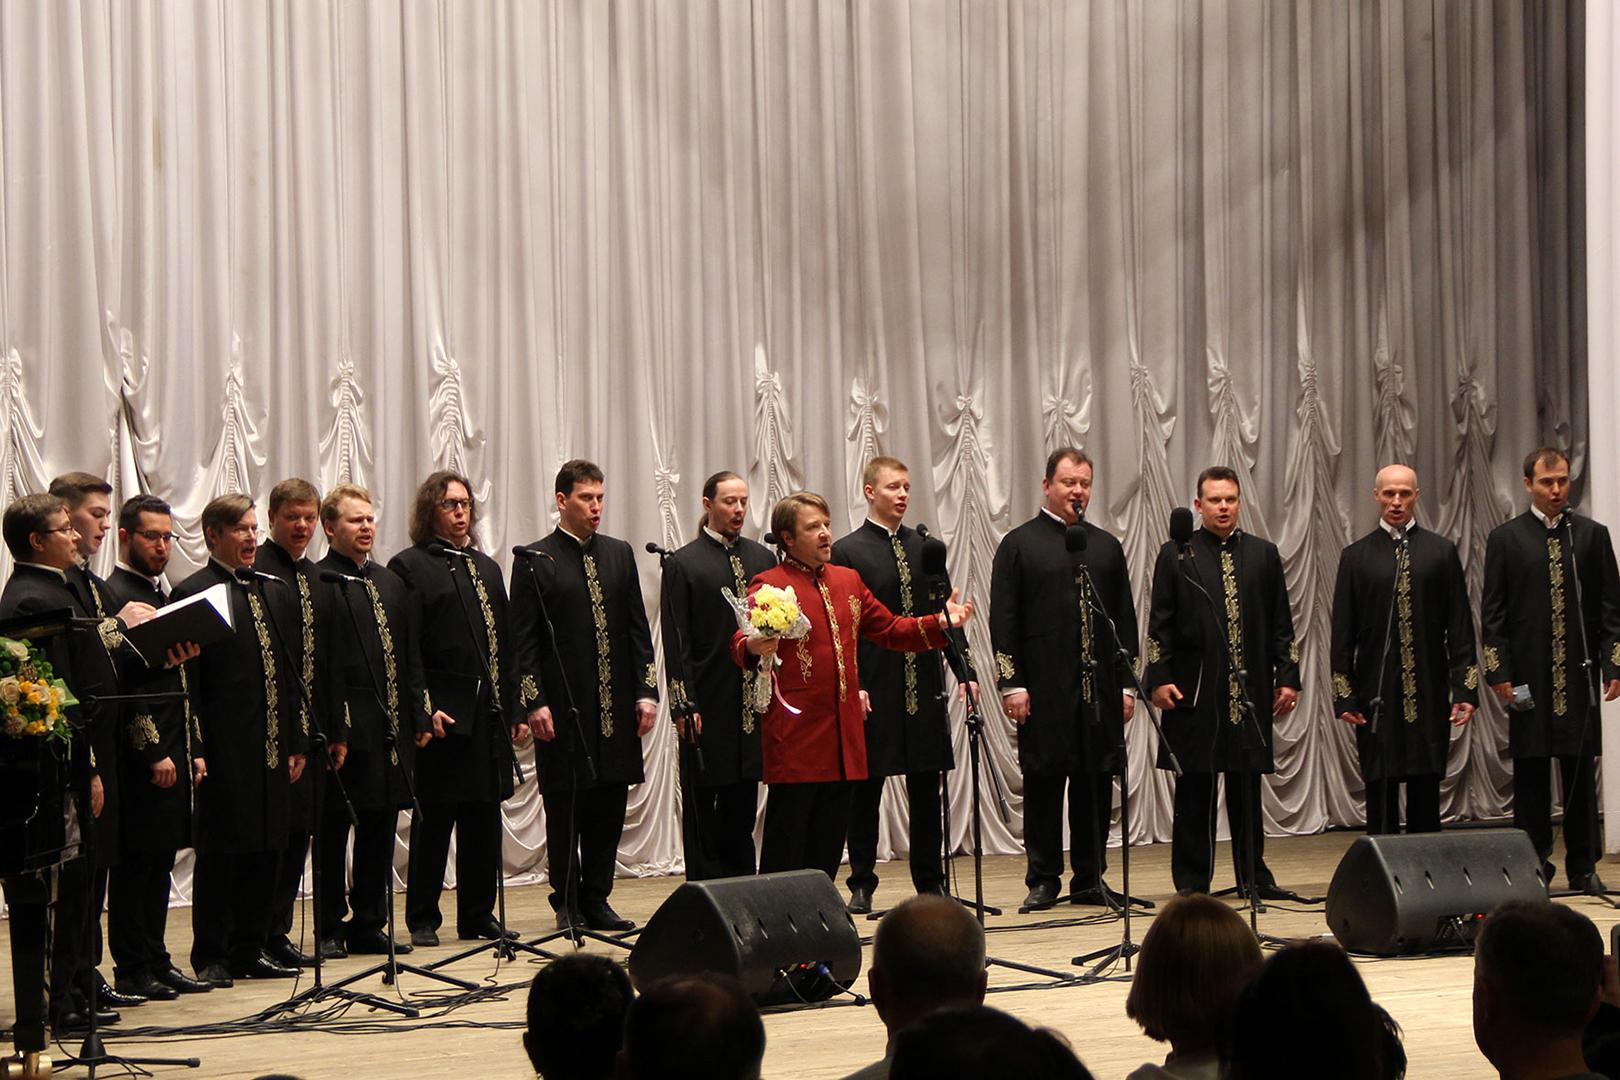 Популярный хор Валаамского монастыря выступил вКлинцах